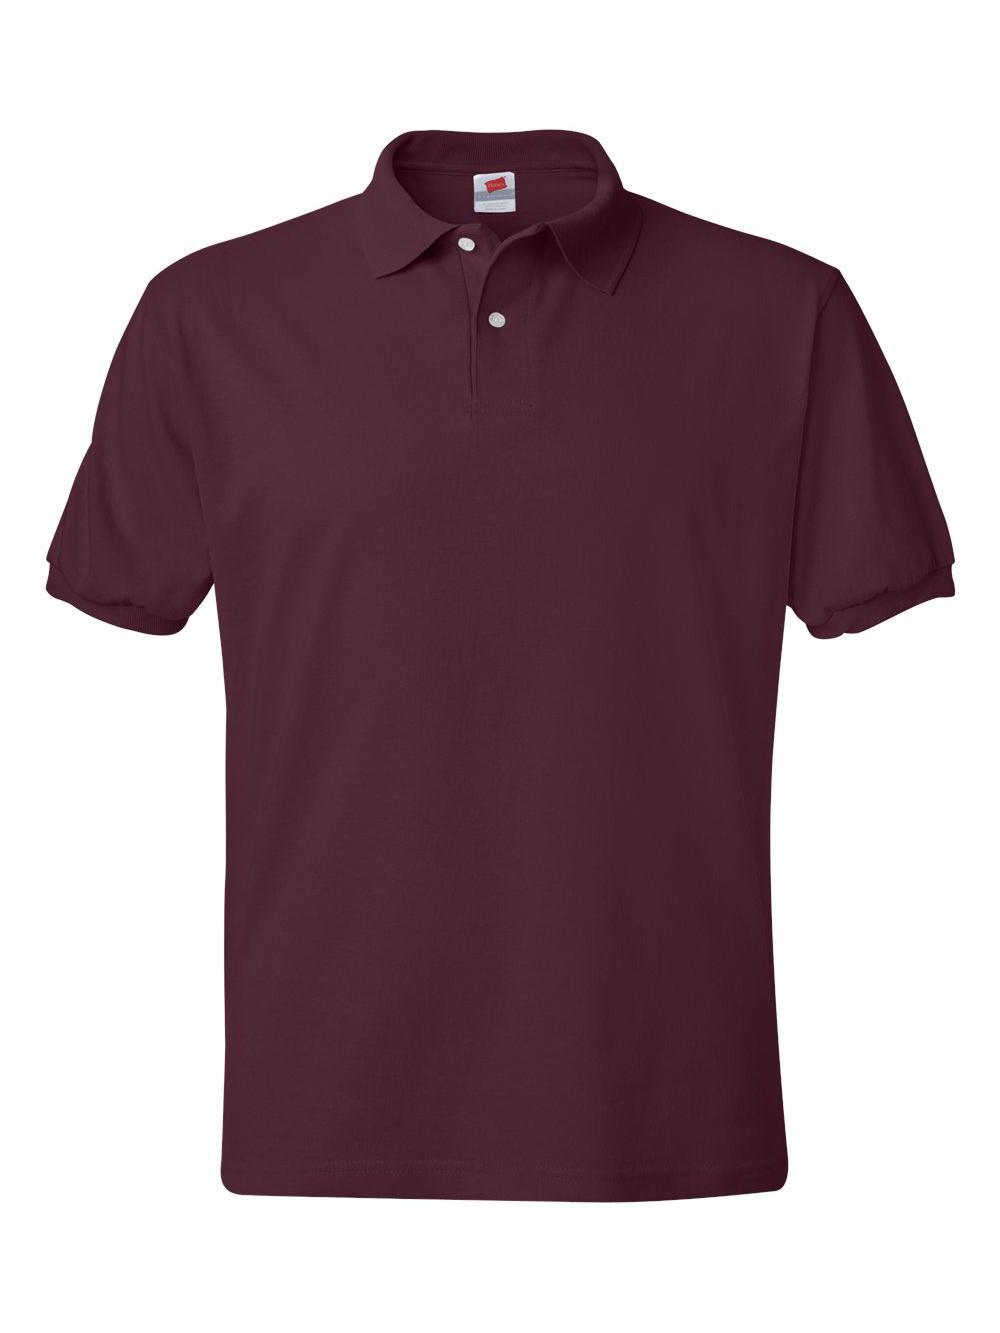 Hanes-Ecosmart-Jersey-Sport-Shirt-054X thumbnail 30